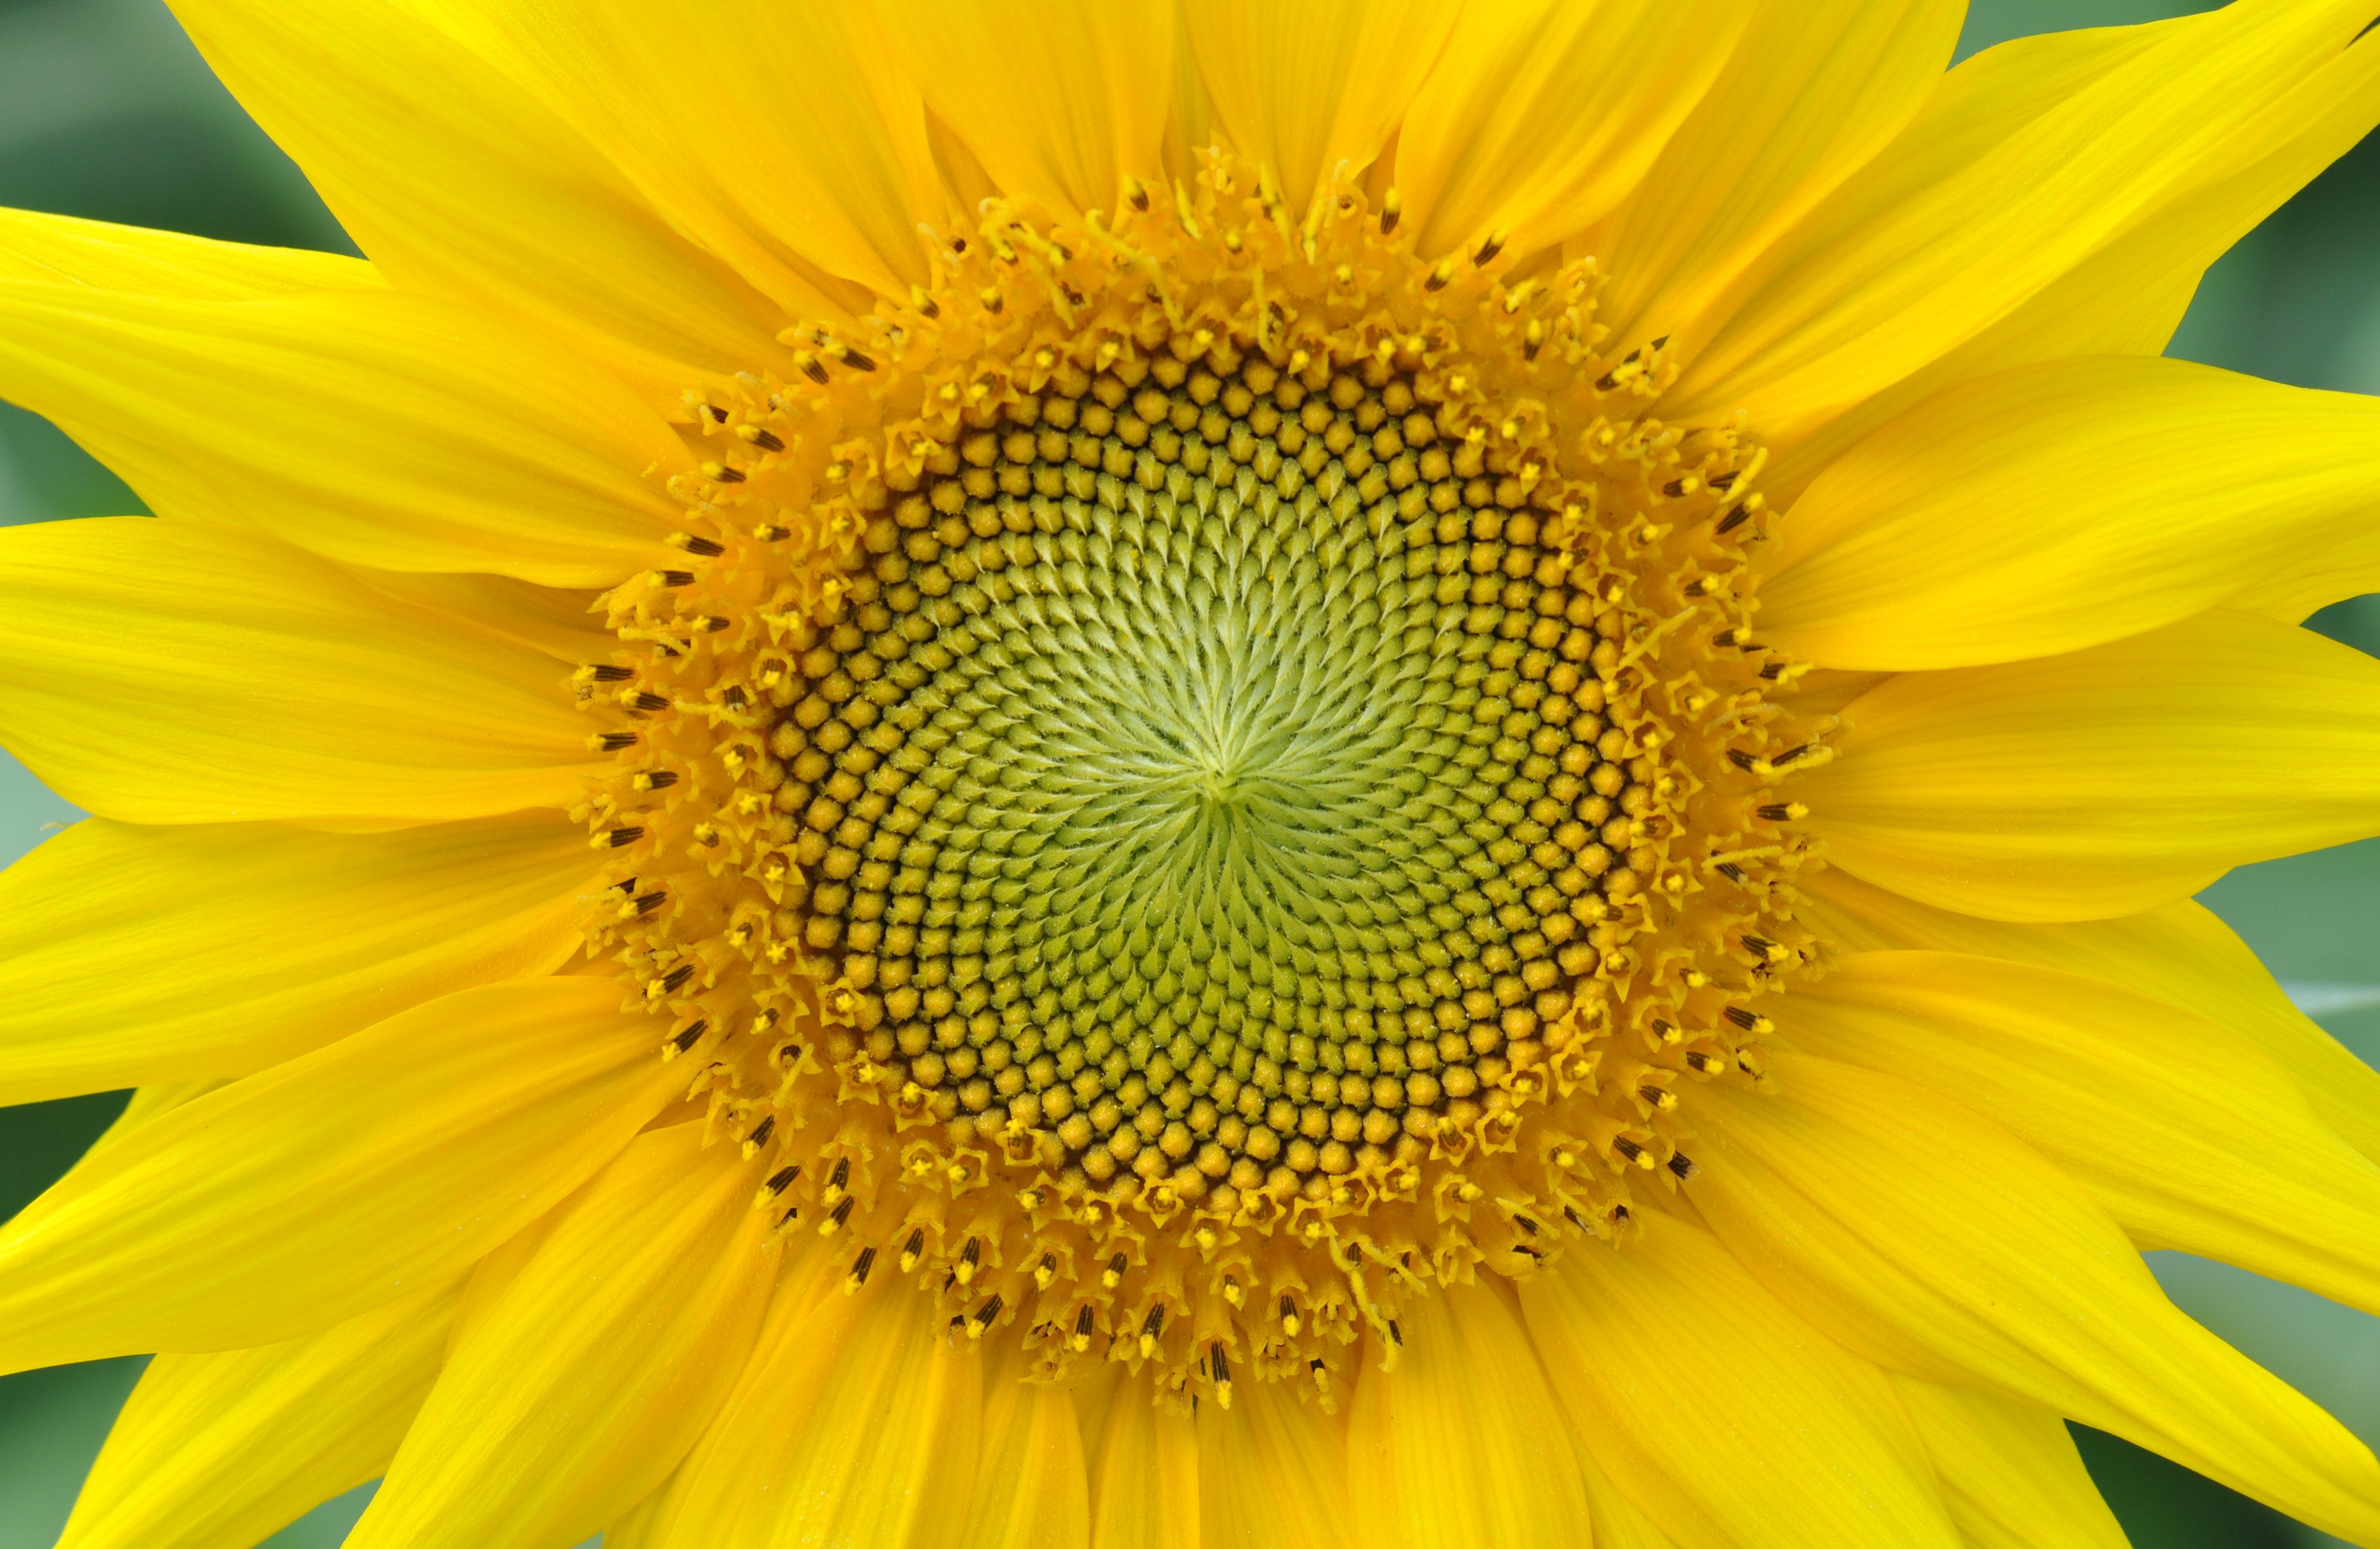 Fileyellow sunflower 001g wikimedia commons fileyellow sunflower 001g mightylinksfo